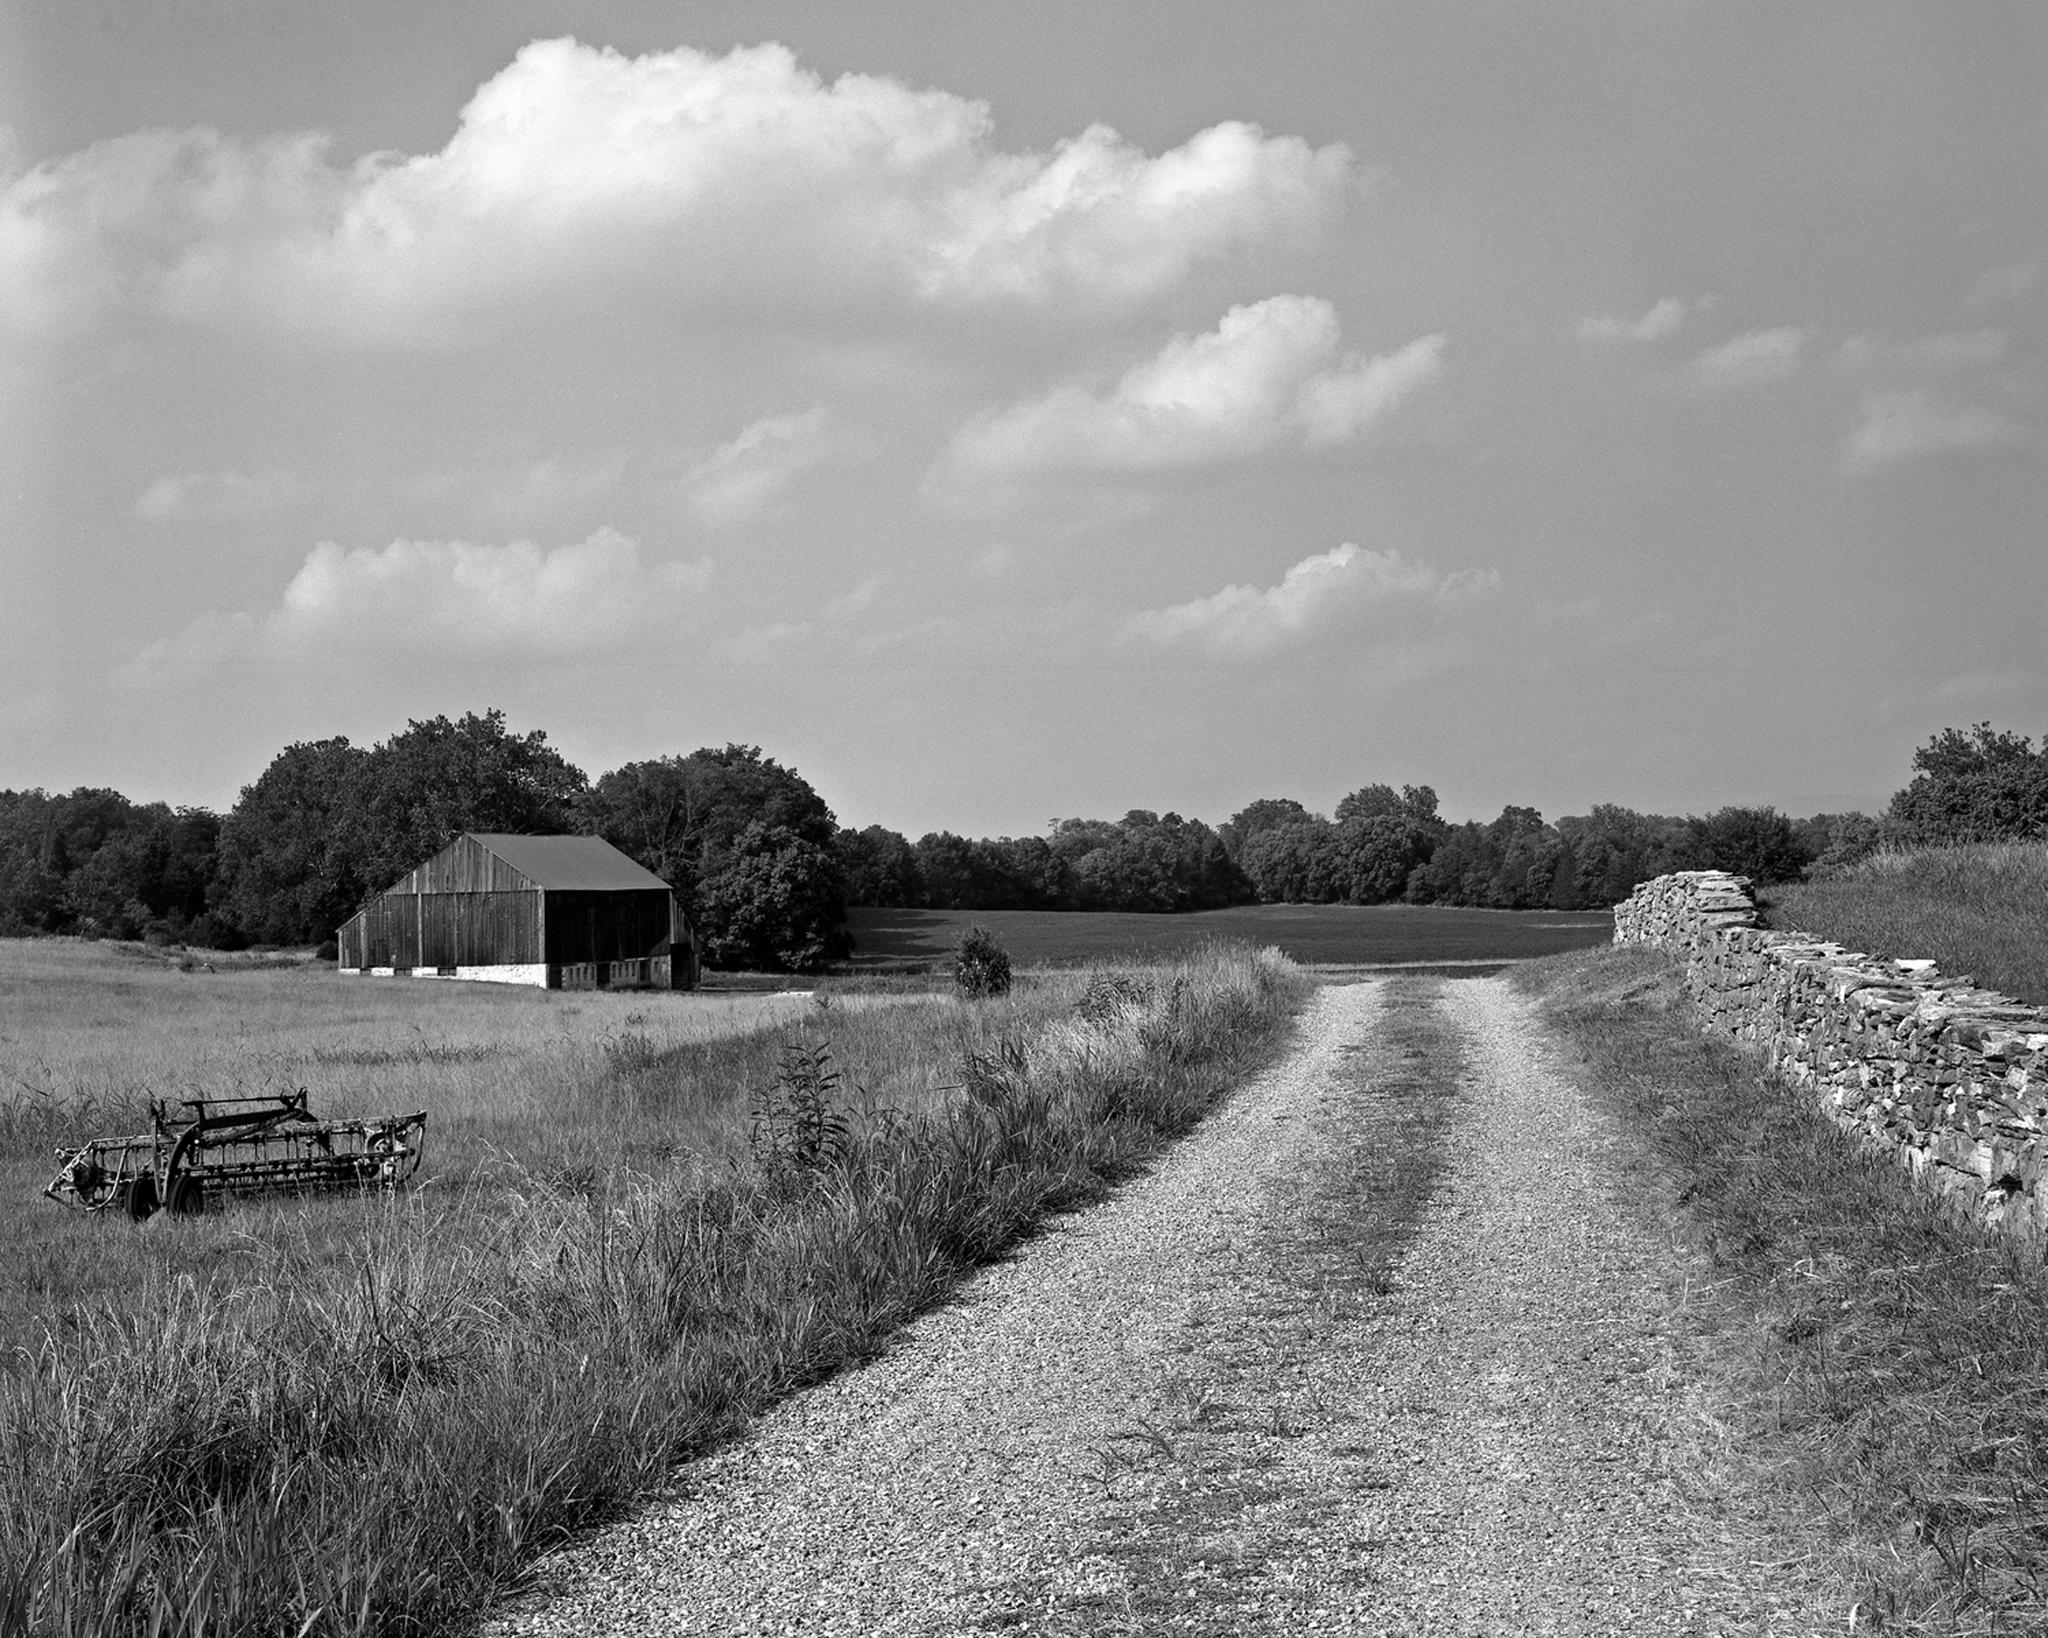 Roulette Farm. Antietam Battlefield. Sharpsburg, Maryland.